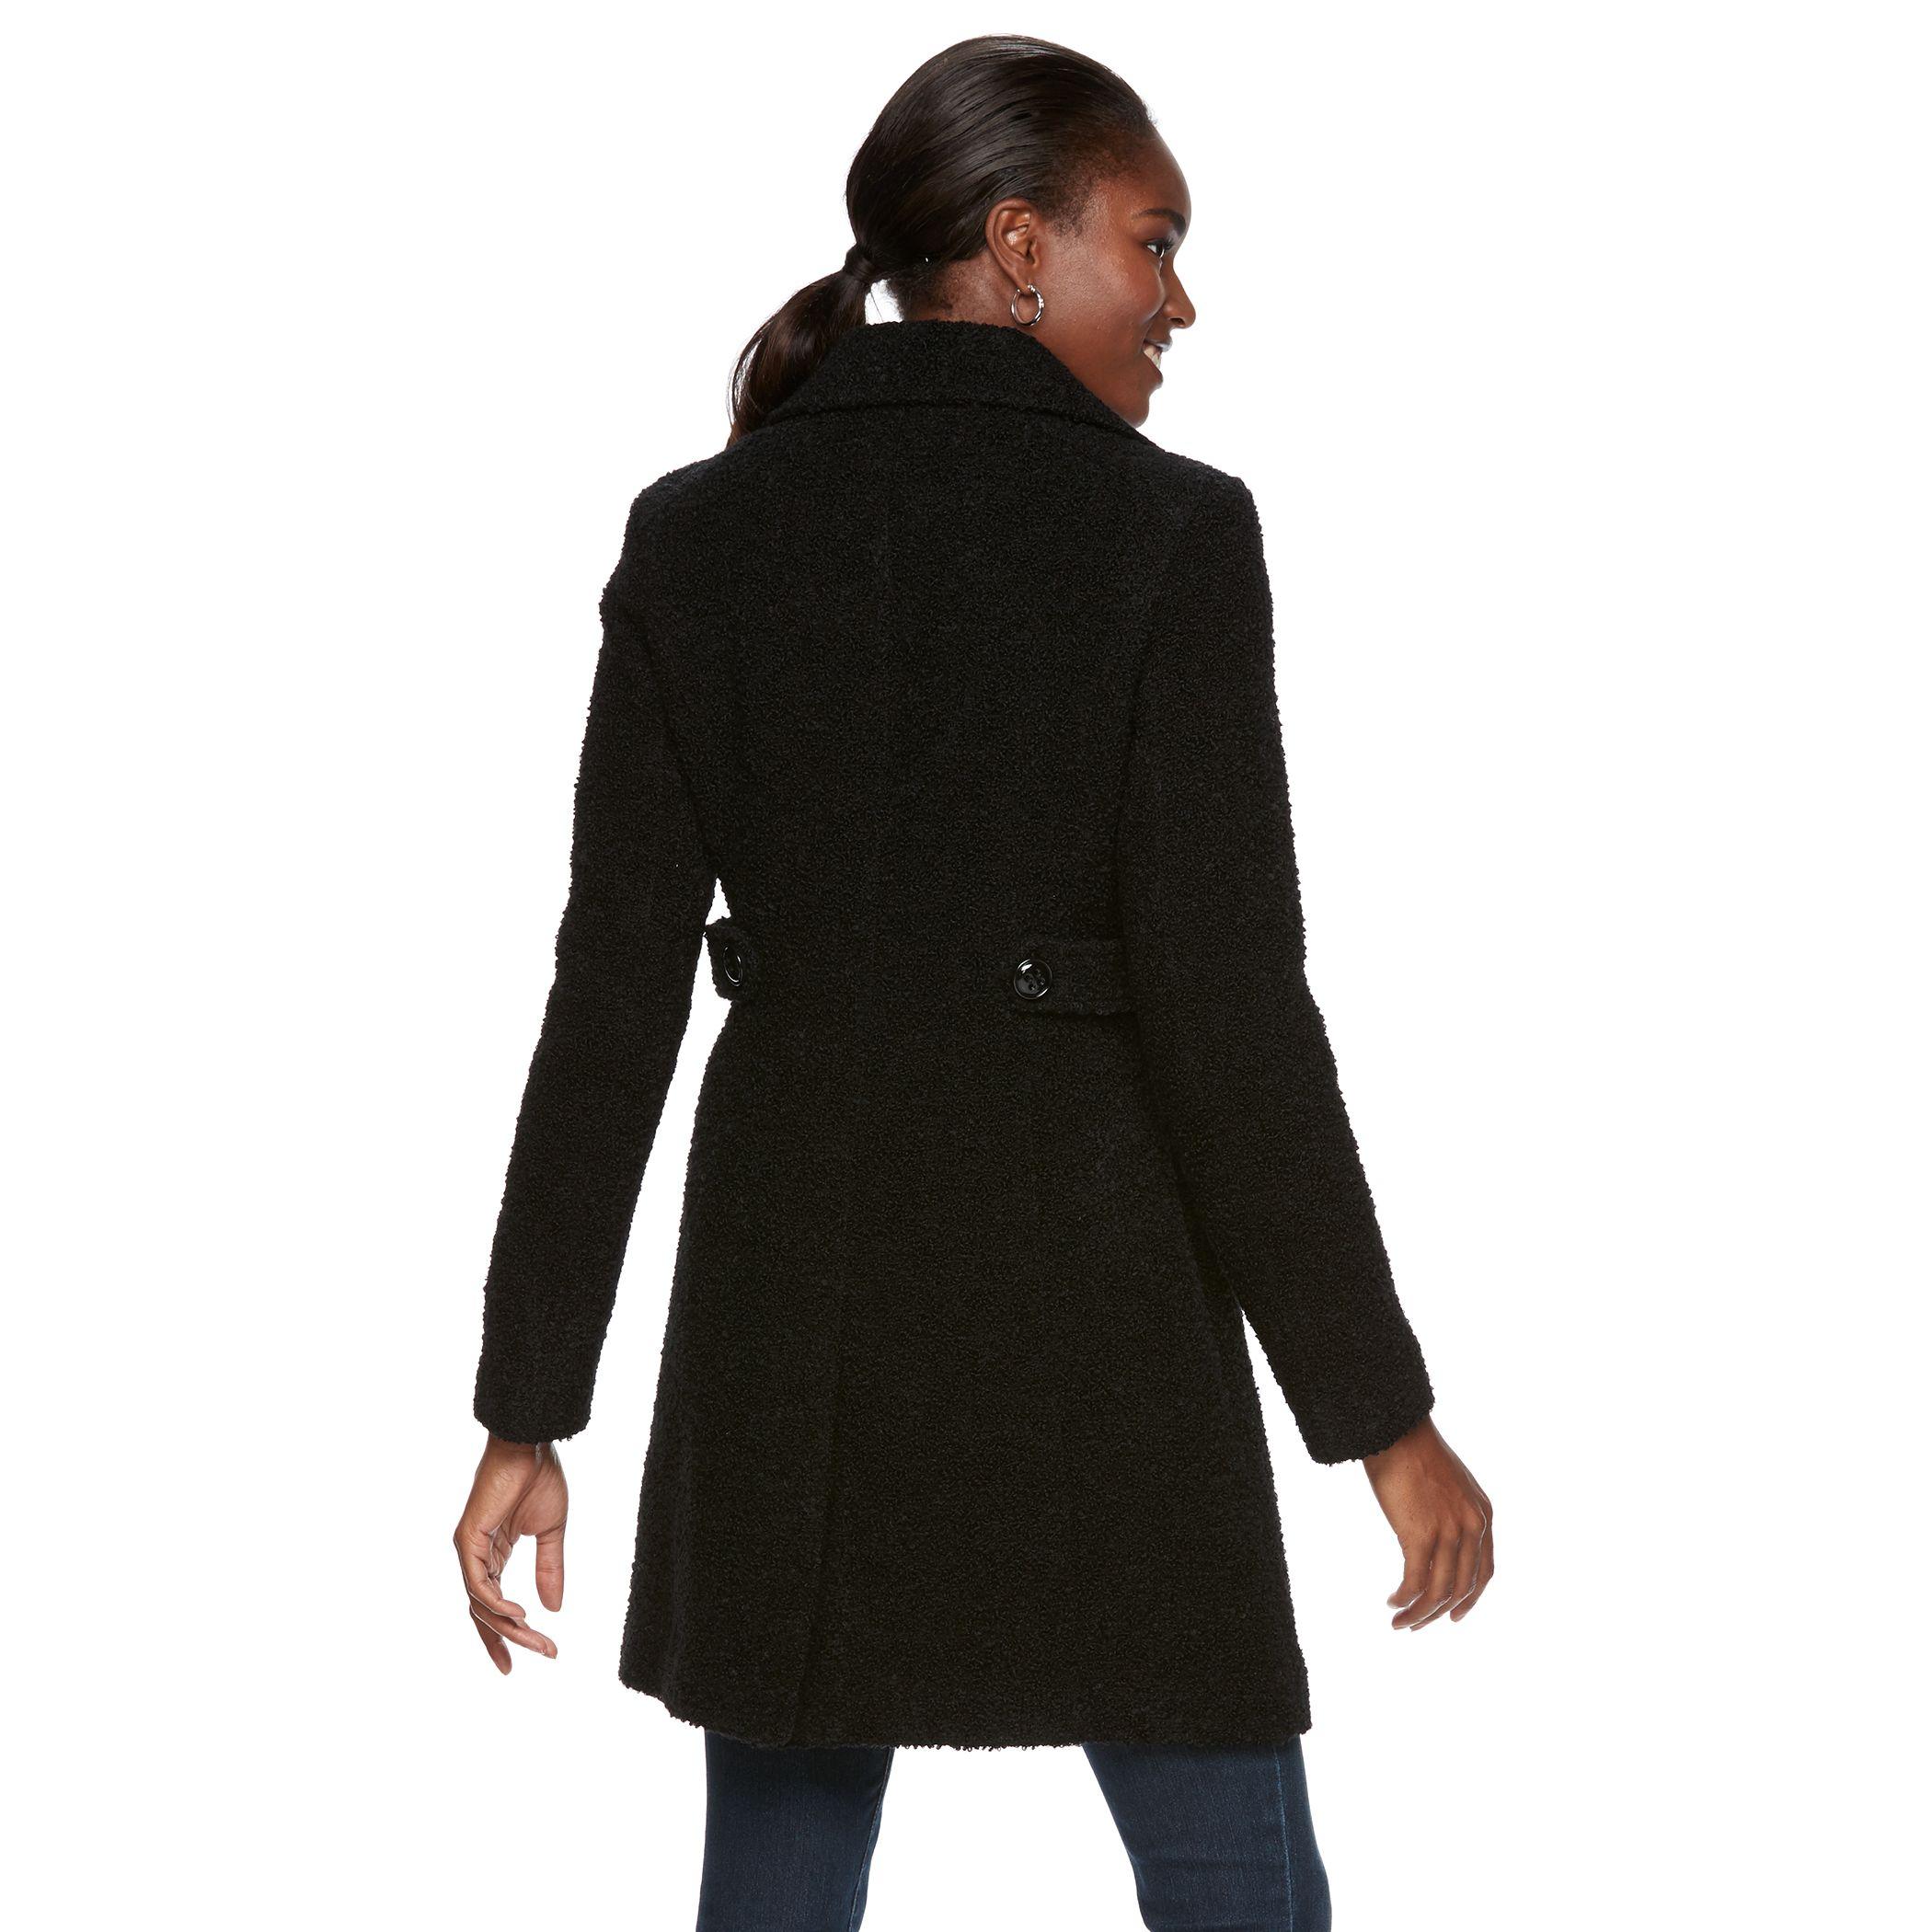 barns jackets jsp clothing coats womens alt gallery catalog kohl outerwear barn s